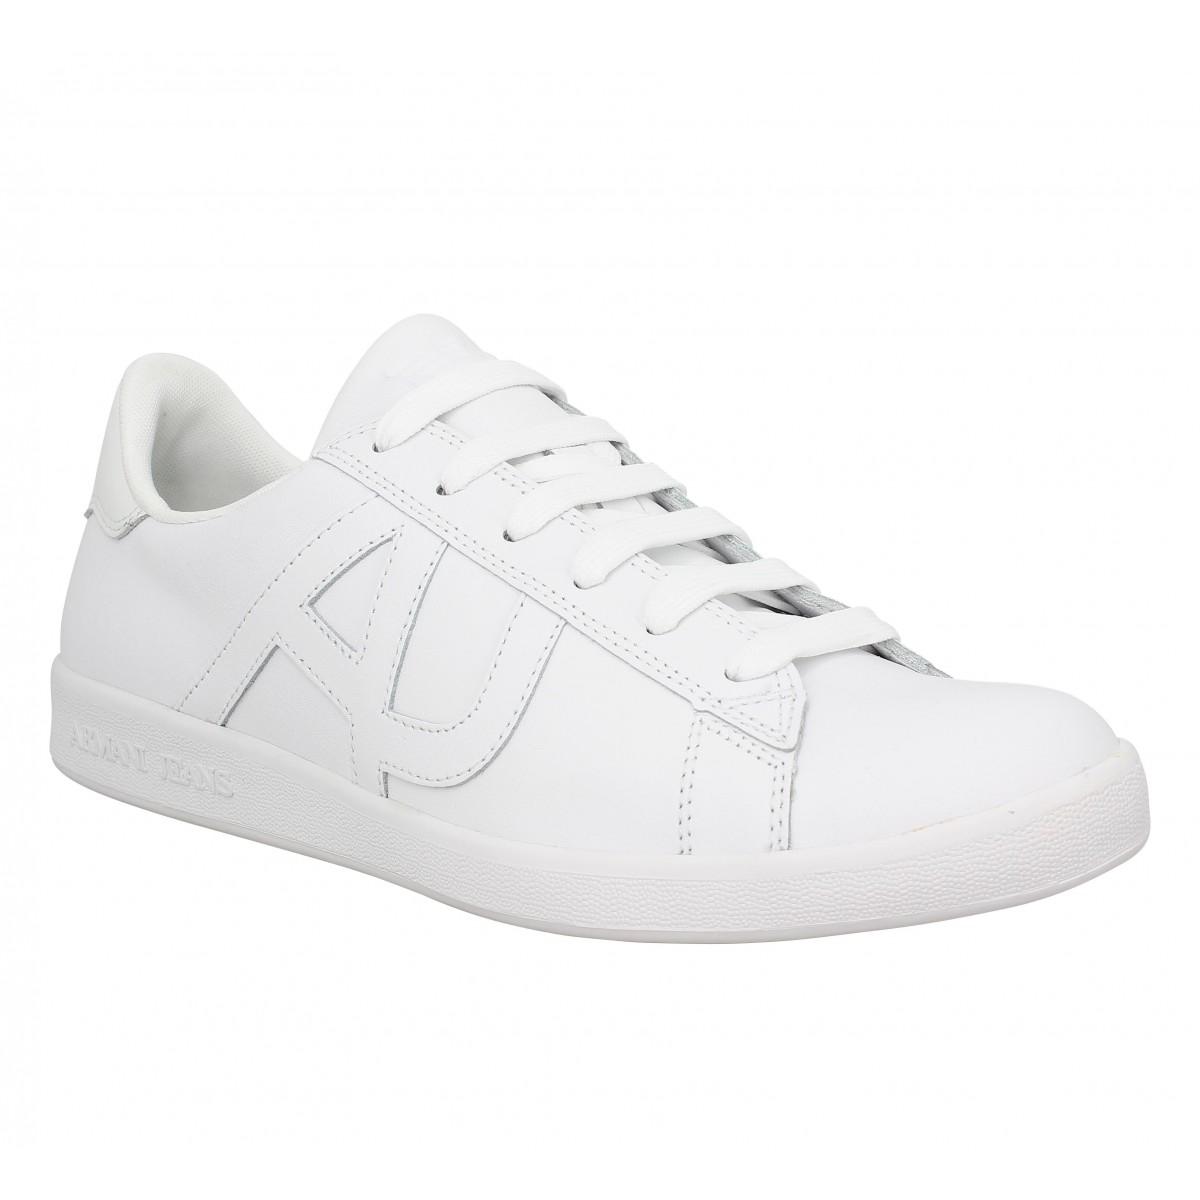 Armani jeans 6565 cuir homme blanc   Fanny chaussures 64b0bd87fae